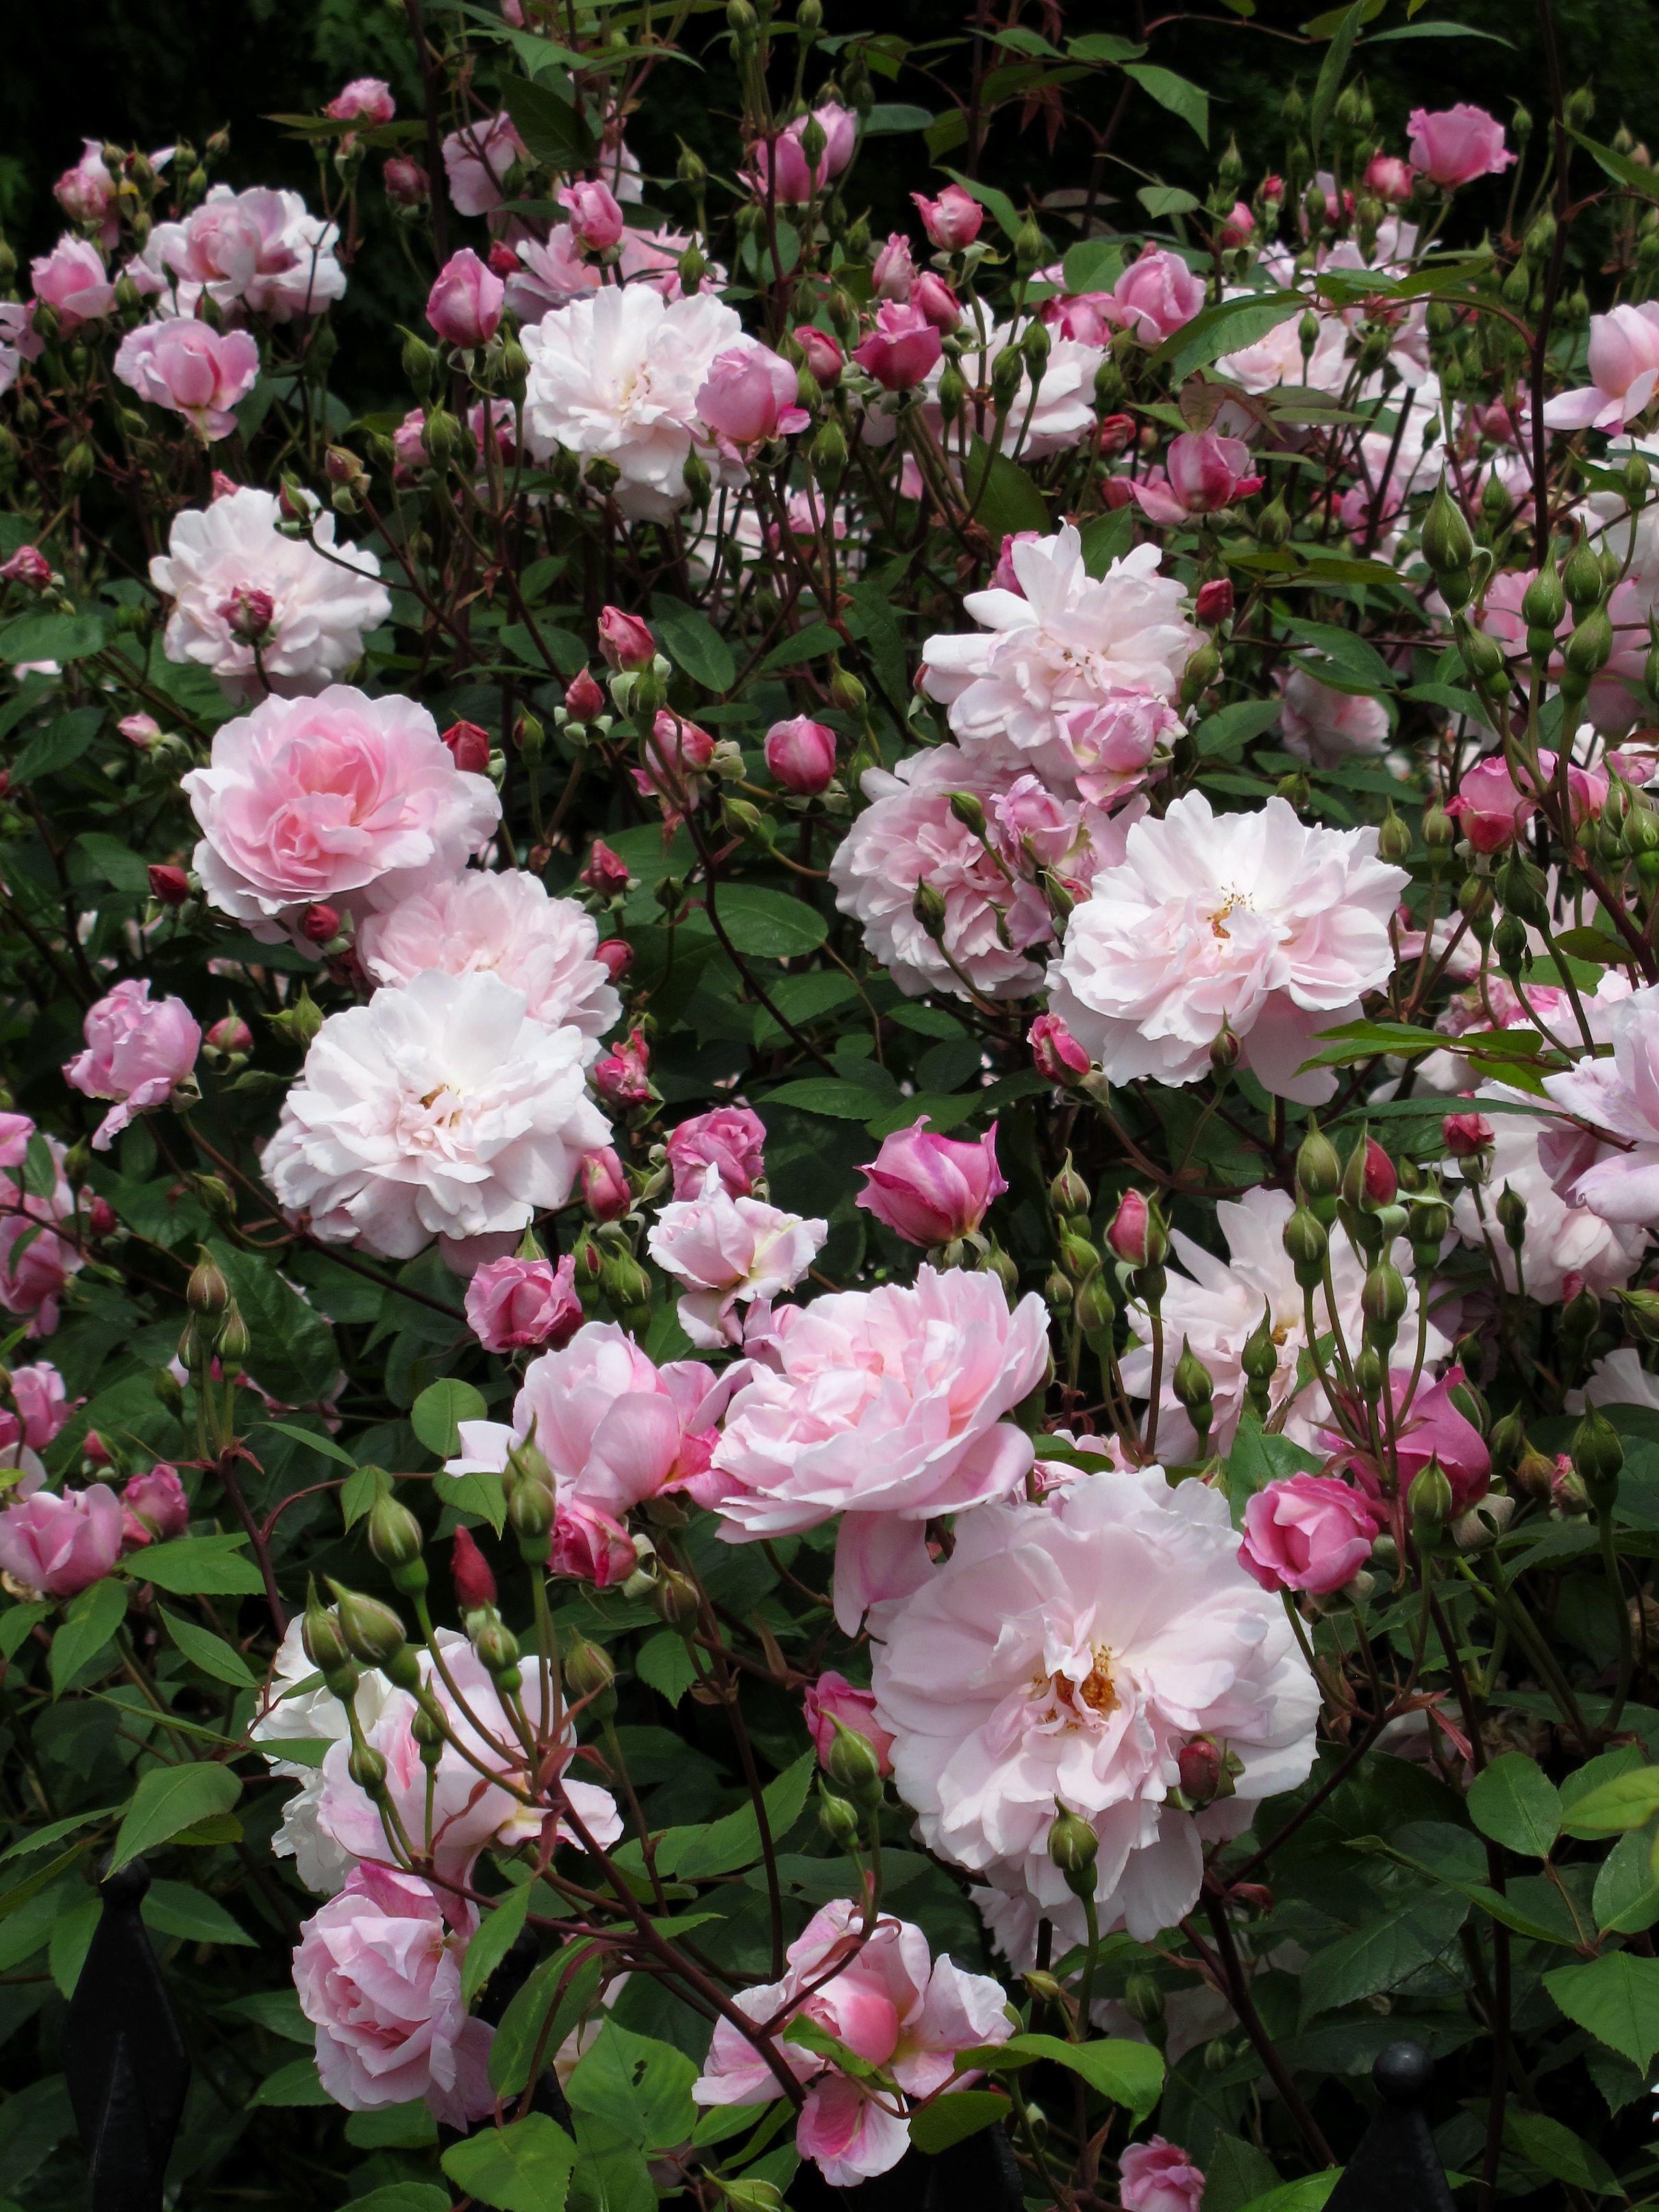 Rosa 'mortimer Sackler' English Roses Blooming Rose